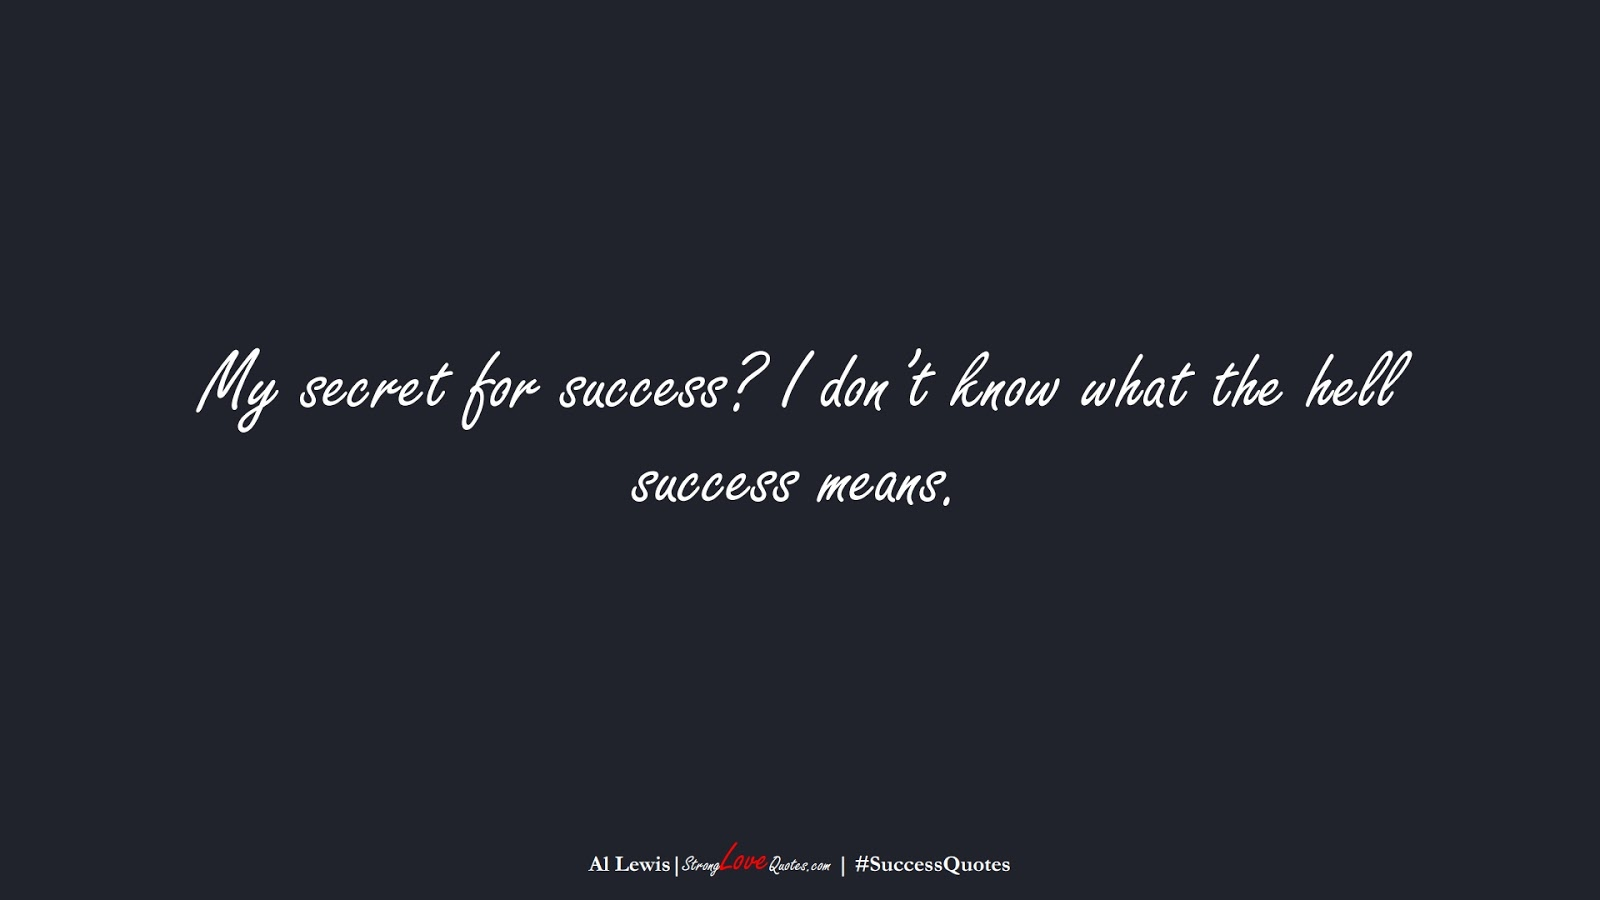 My secret for success? I don't know what the hell success means. (Al Lewis);  #SuccessQuotes